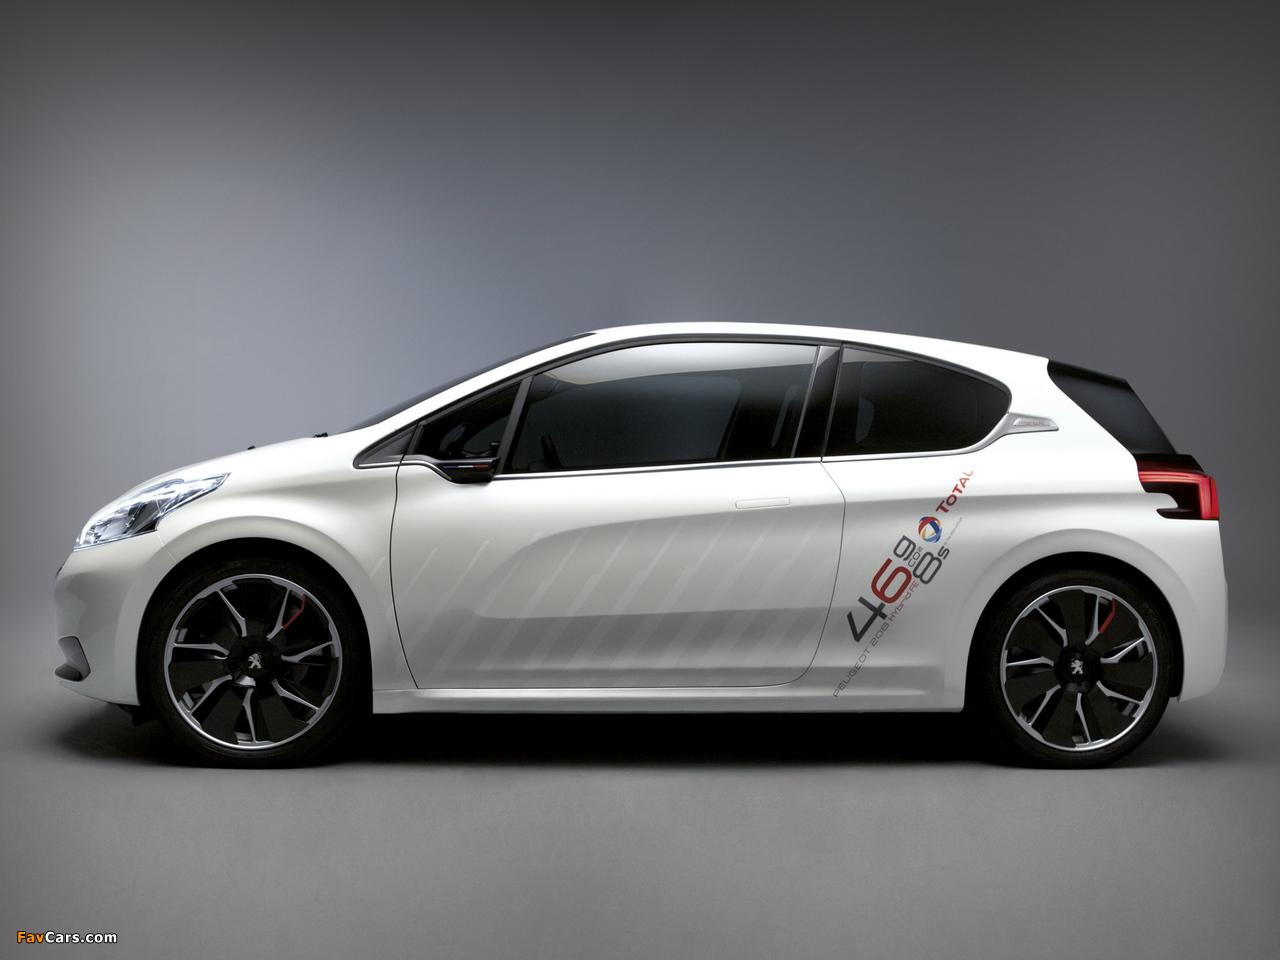 Peugeot 208 HYbrid FE Concept 2013 pictures (1280 x 960)